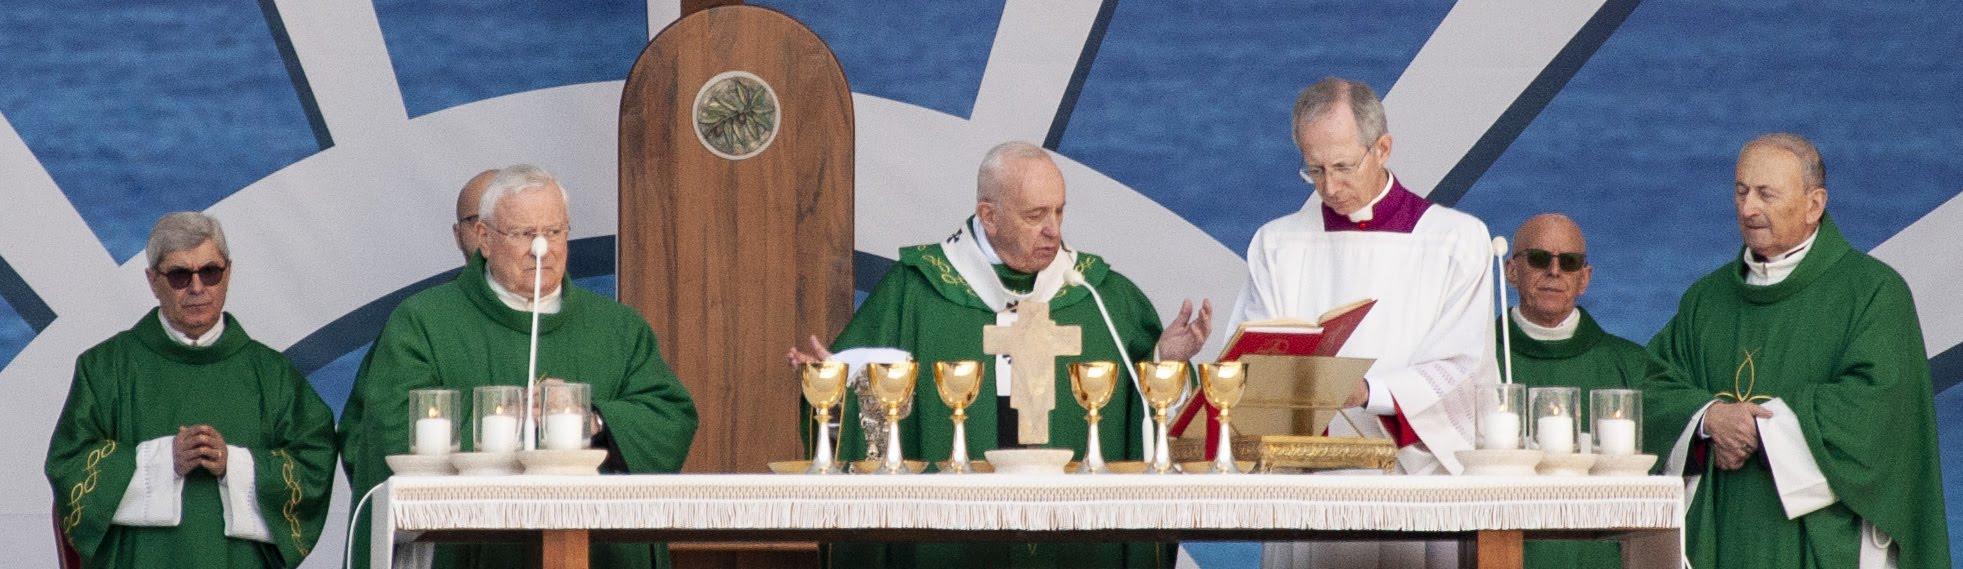 20200223 Bari Papa Francesco 200 (Copia di NXPowerLite).jpg